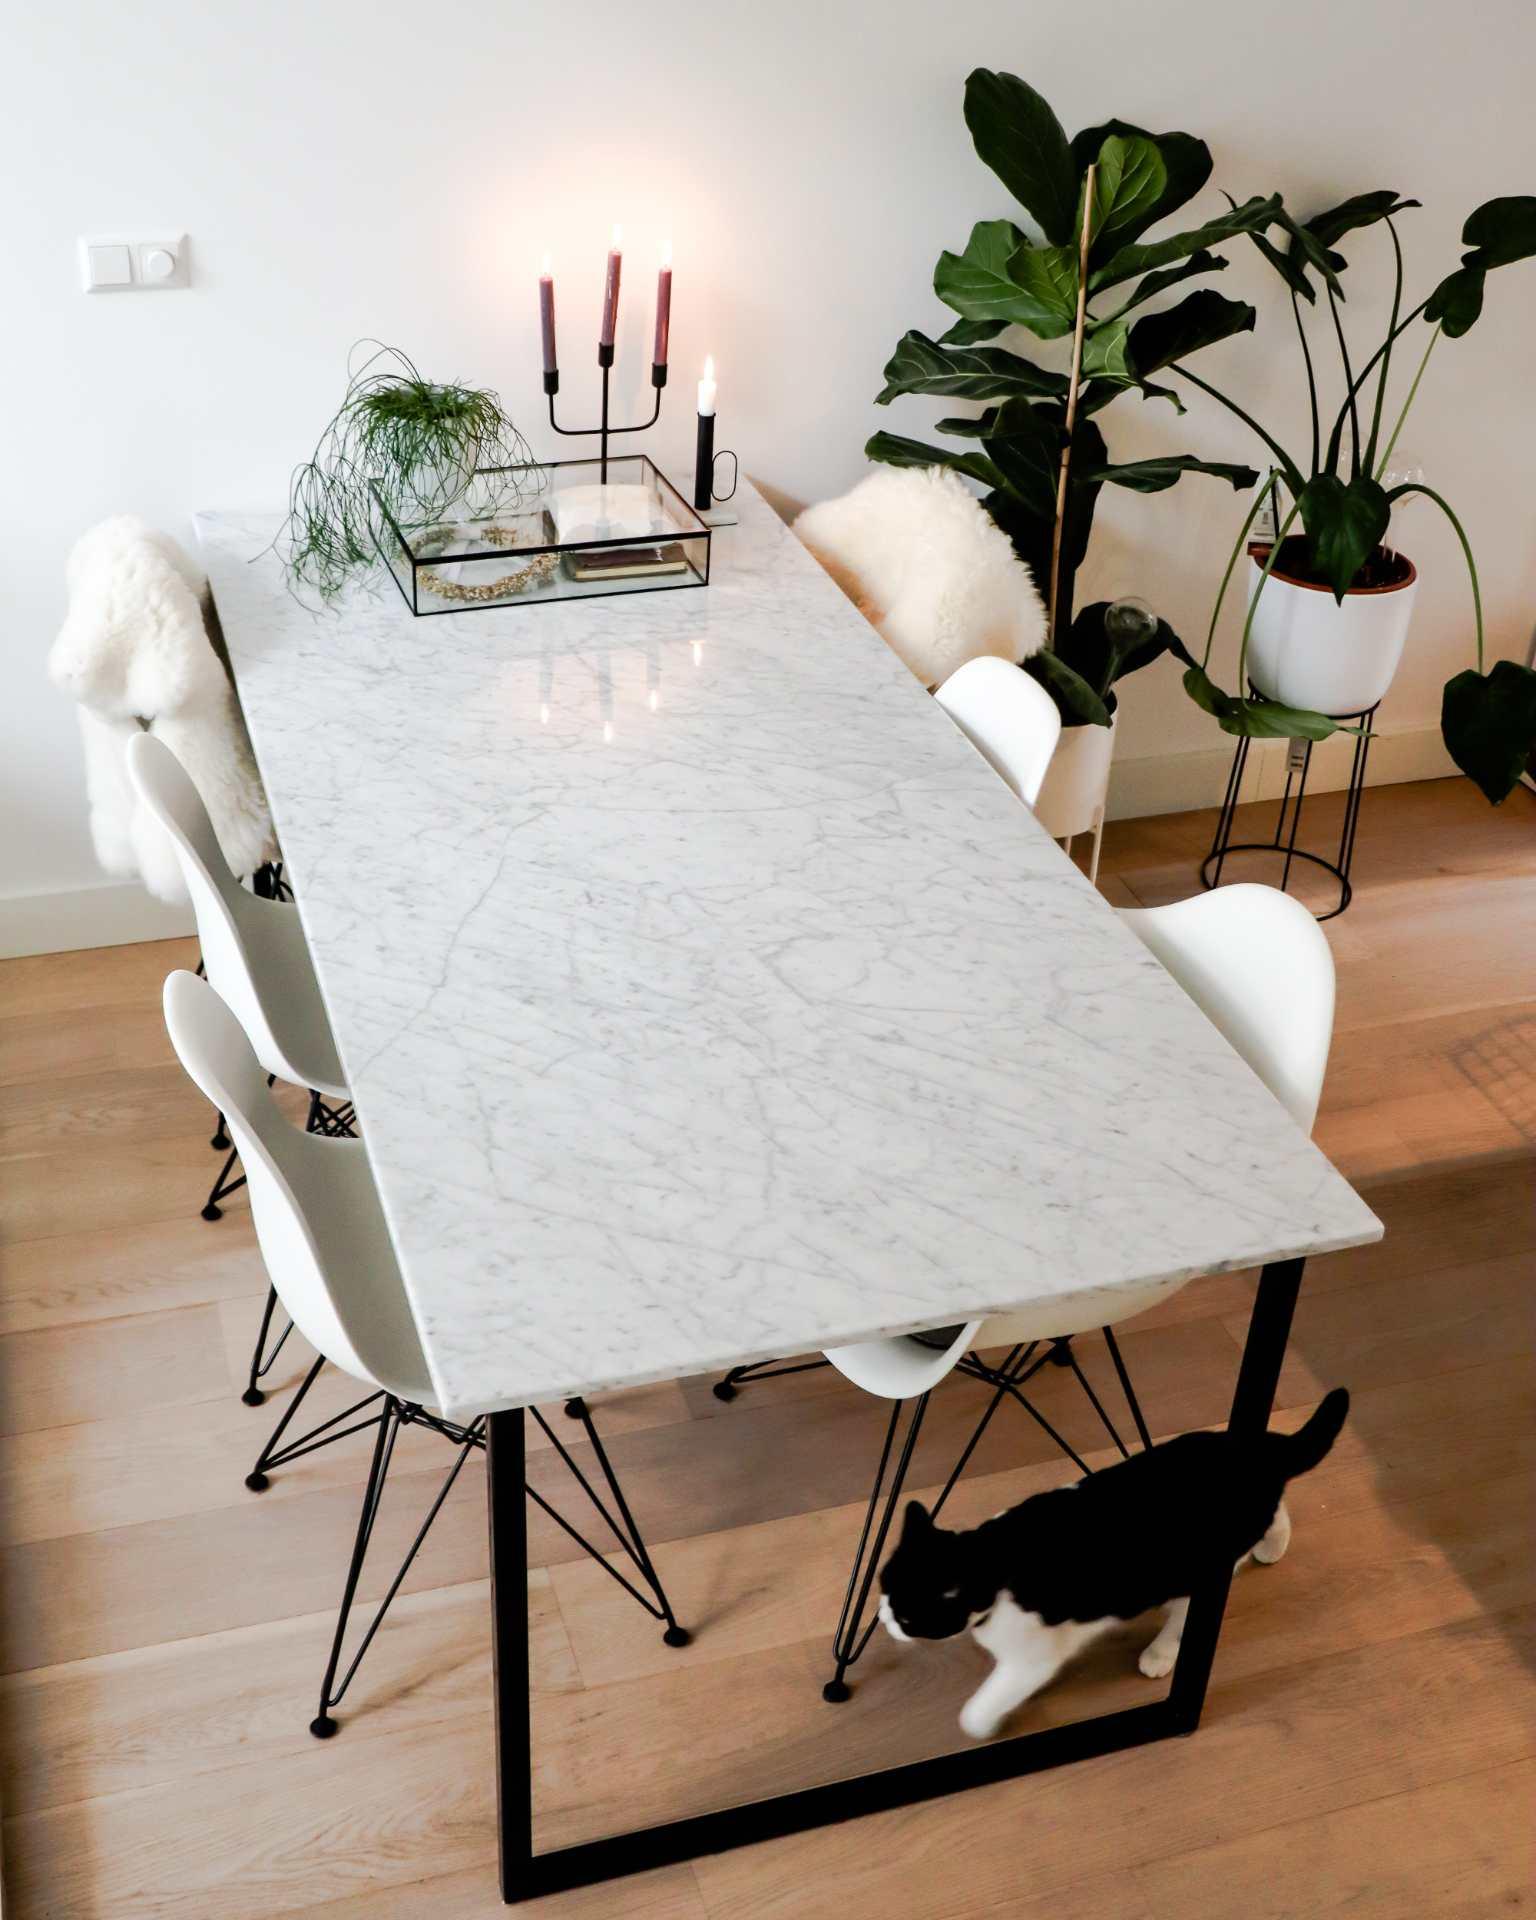 Rectangular Marble Dining Table Bianco Carrara White U Frame Aime Té